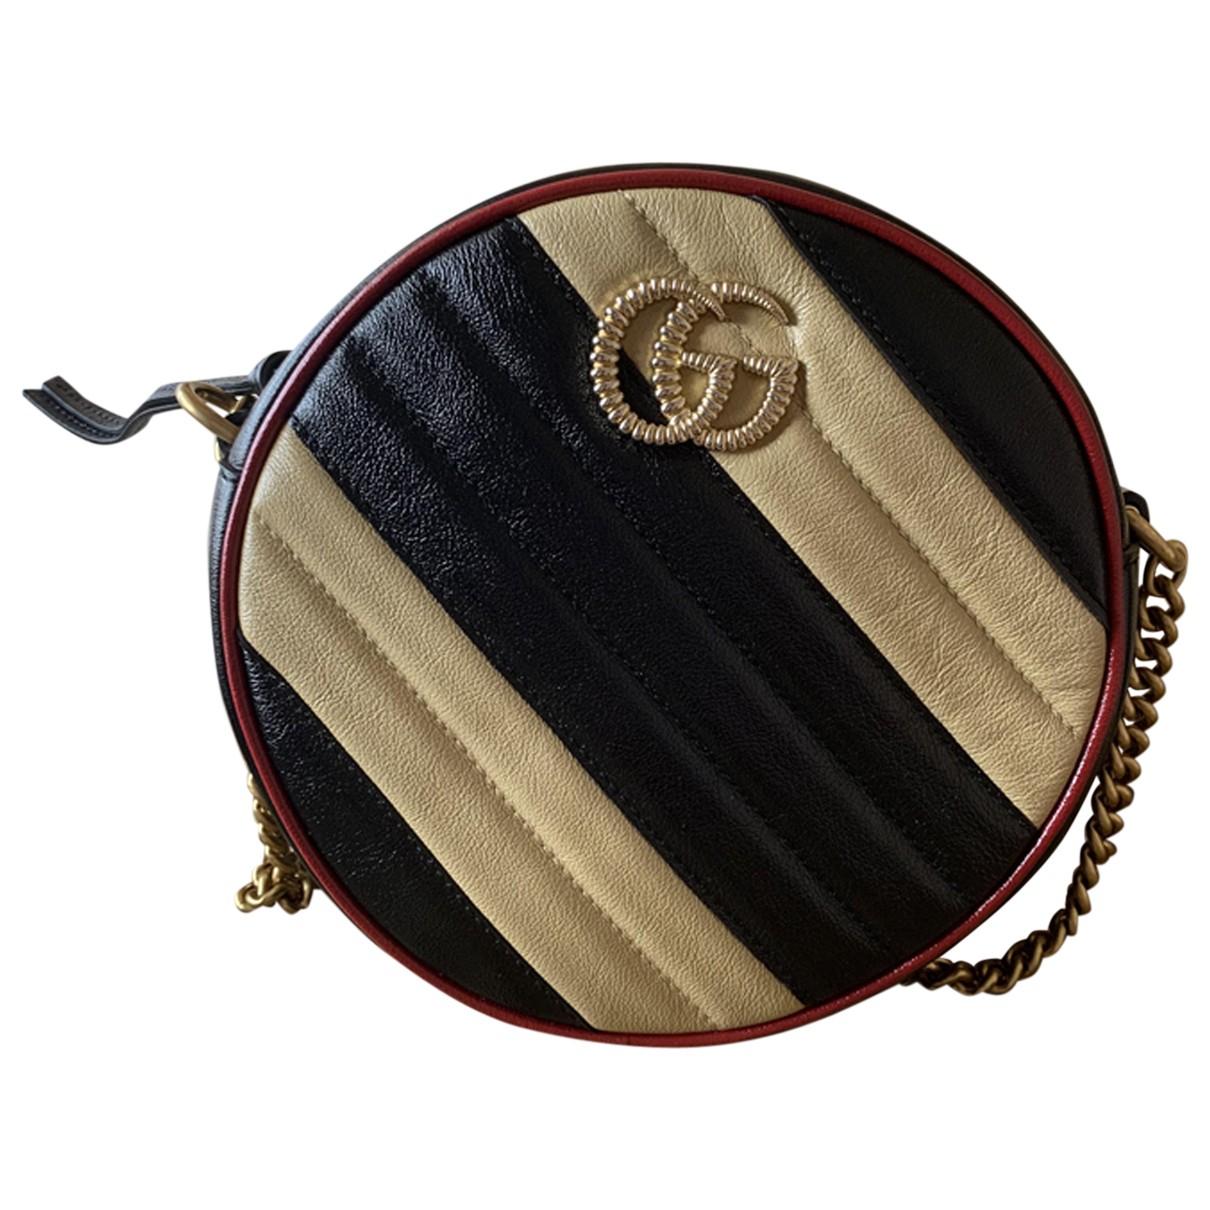 Bandolera GG Marmont Circle de Cuero Gucci